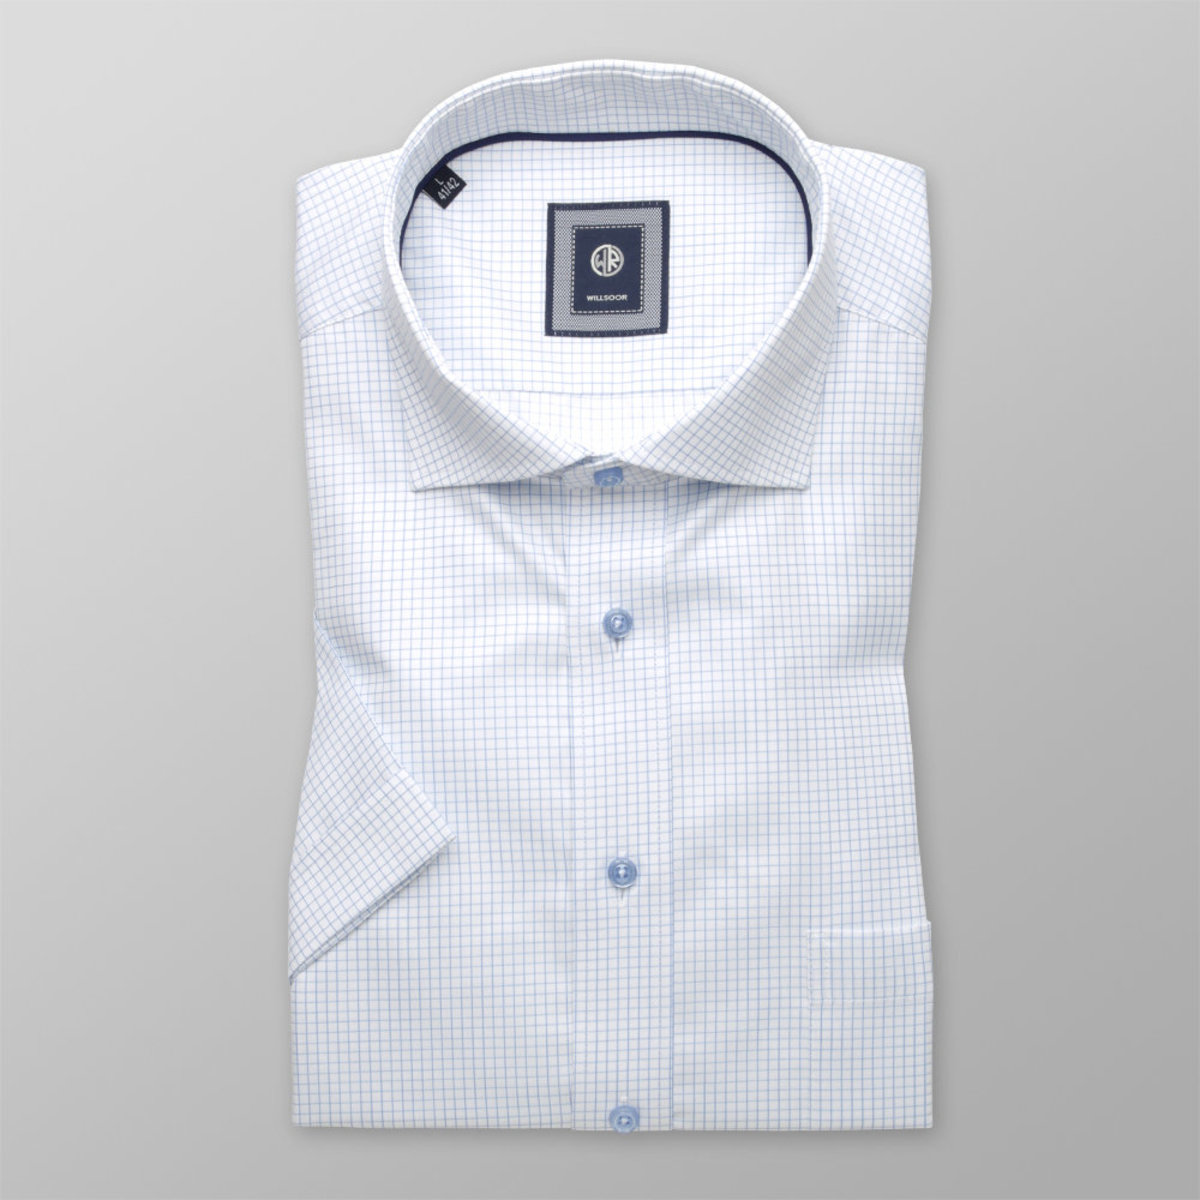 Košeľa klasická s bledo modrým vzorom (výška 176 - 182) 10837 176-182 / XL (43/44)